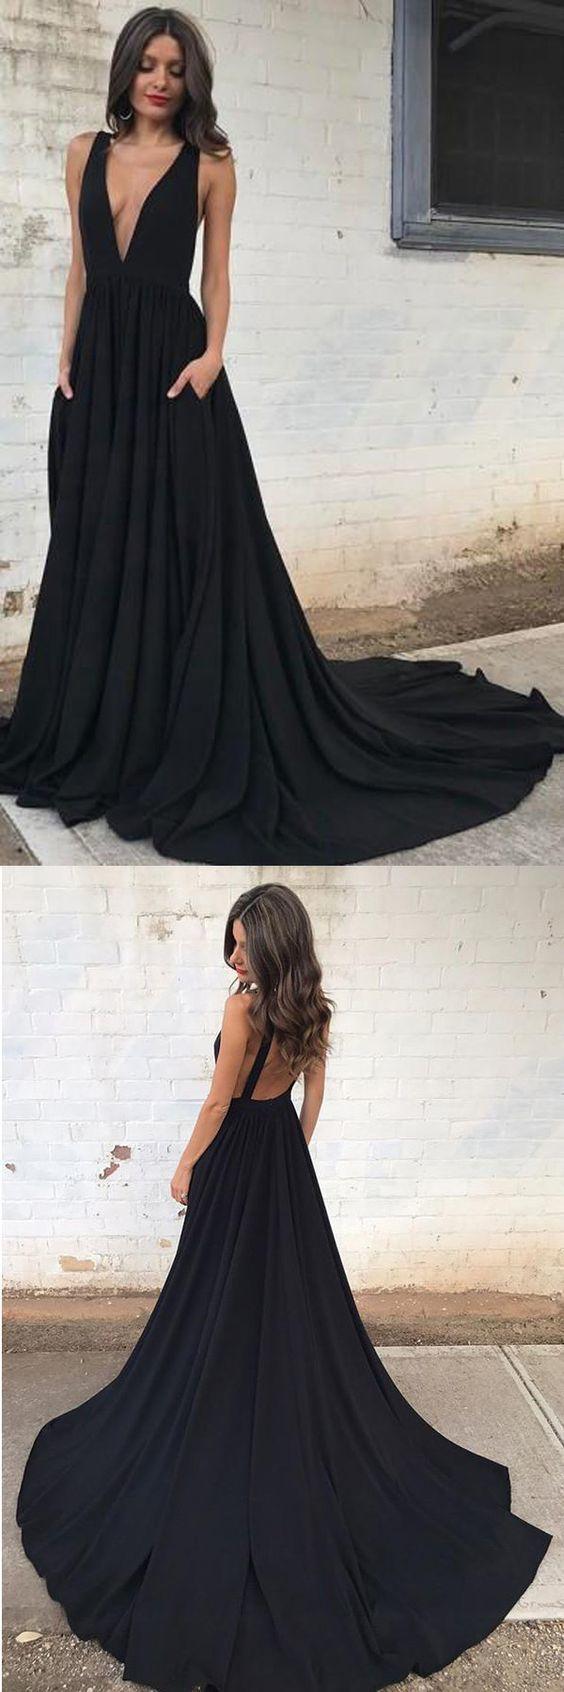 Deep vneck court train sleeveless backless black chiffon prom dress